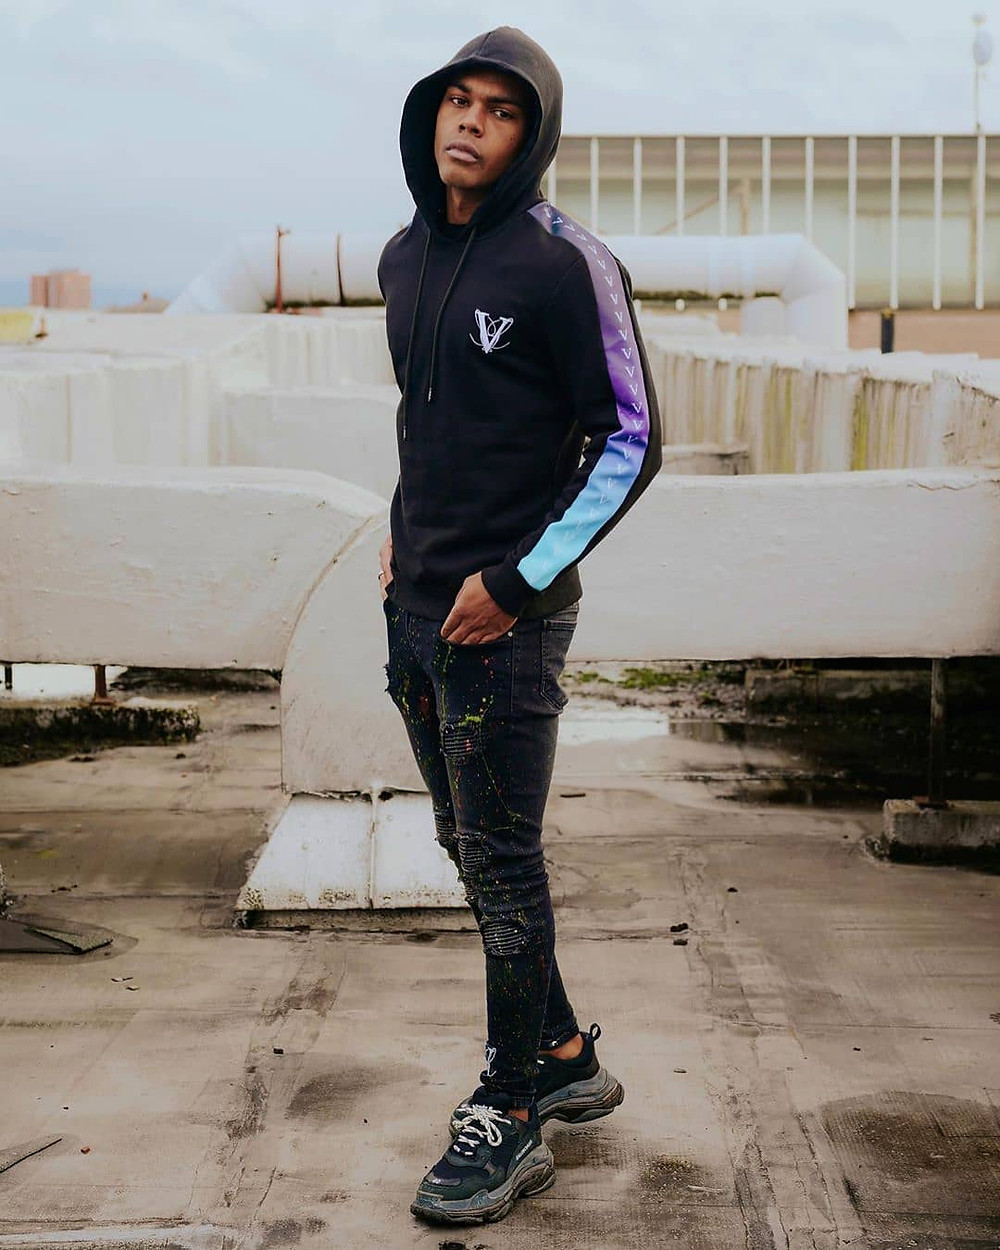 man in hoodie standing in an urban environment.